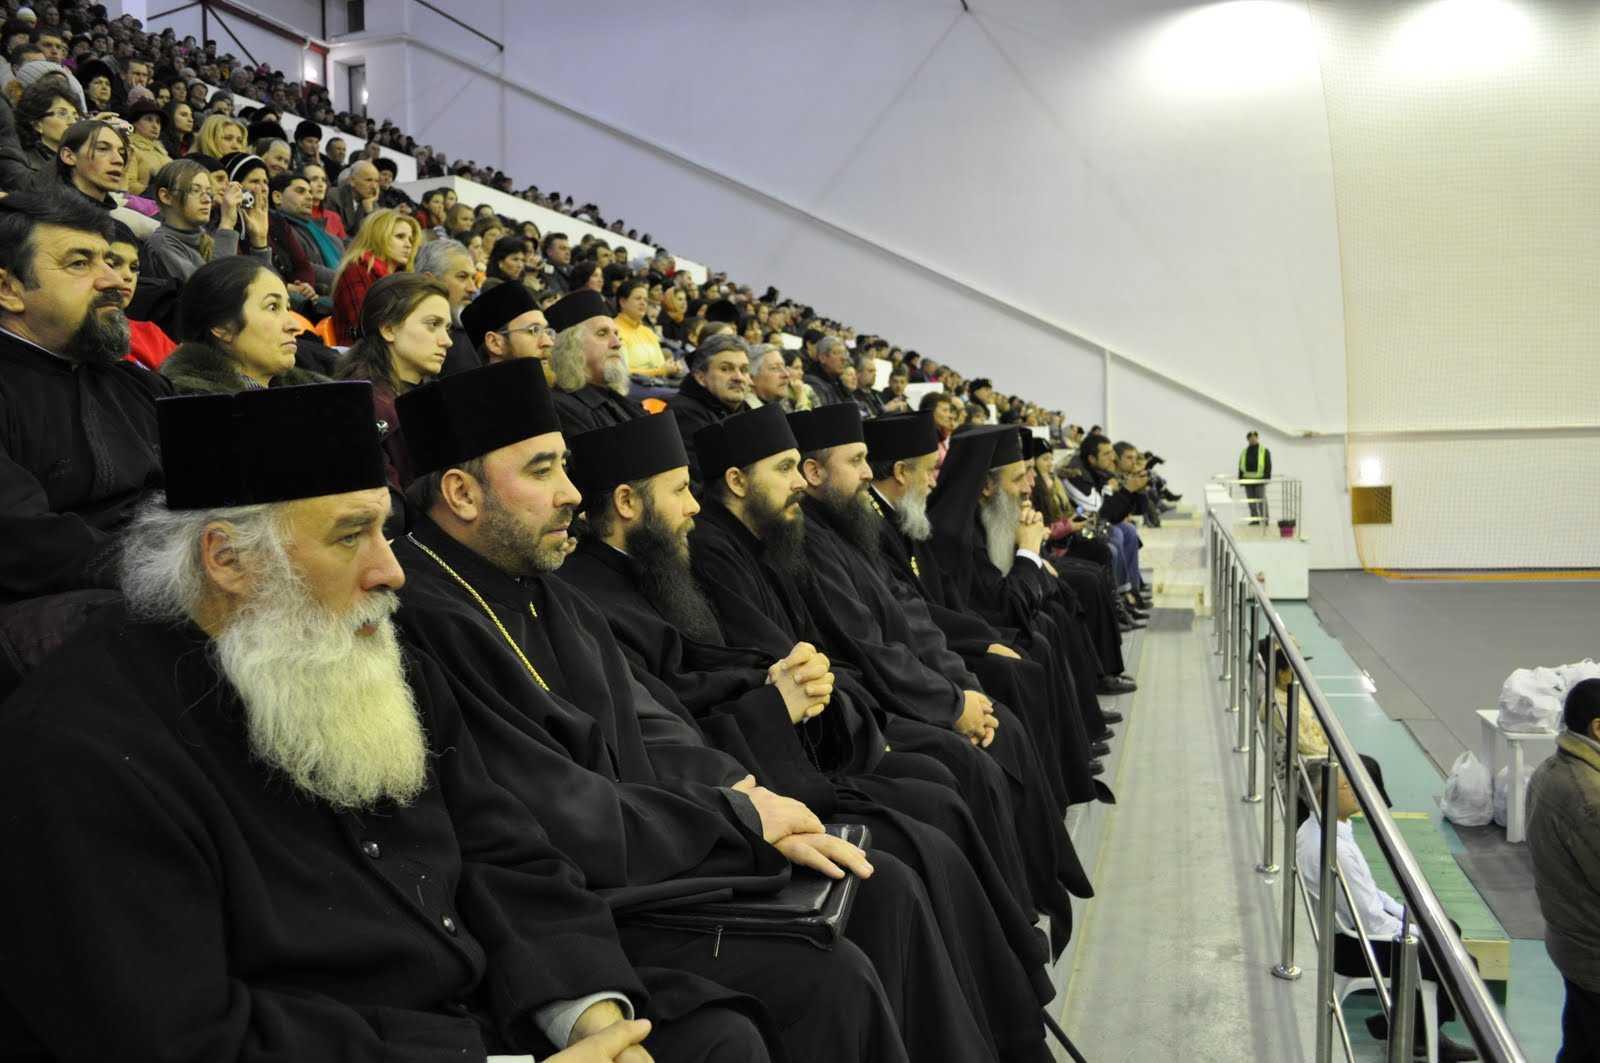 Parintii Arsenie Papacioc si Proclu Nicau despre JUDECAREA PREOTILOR (VIDEO)